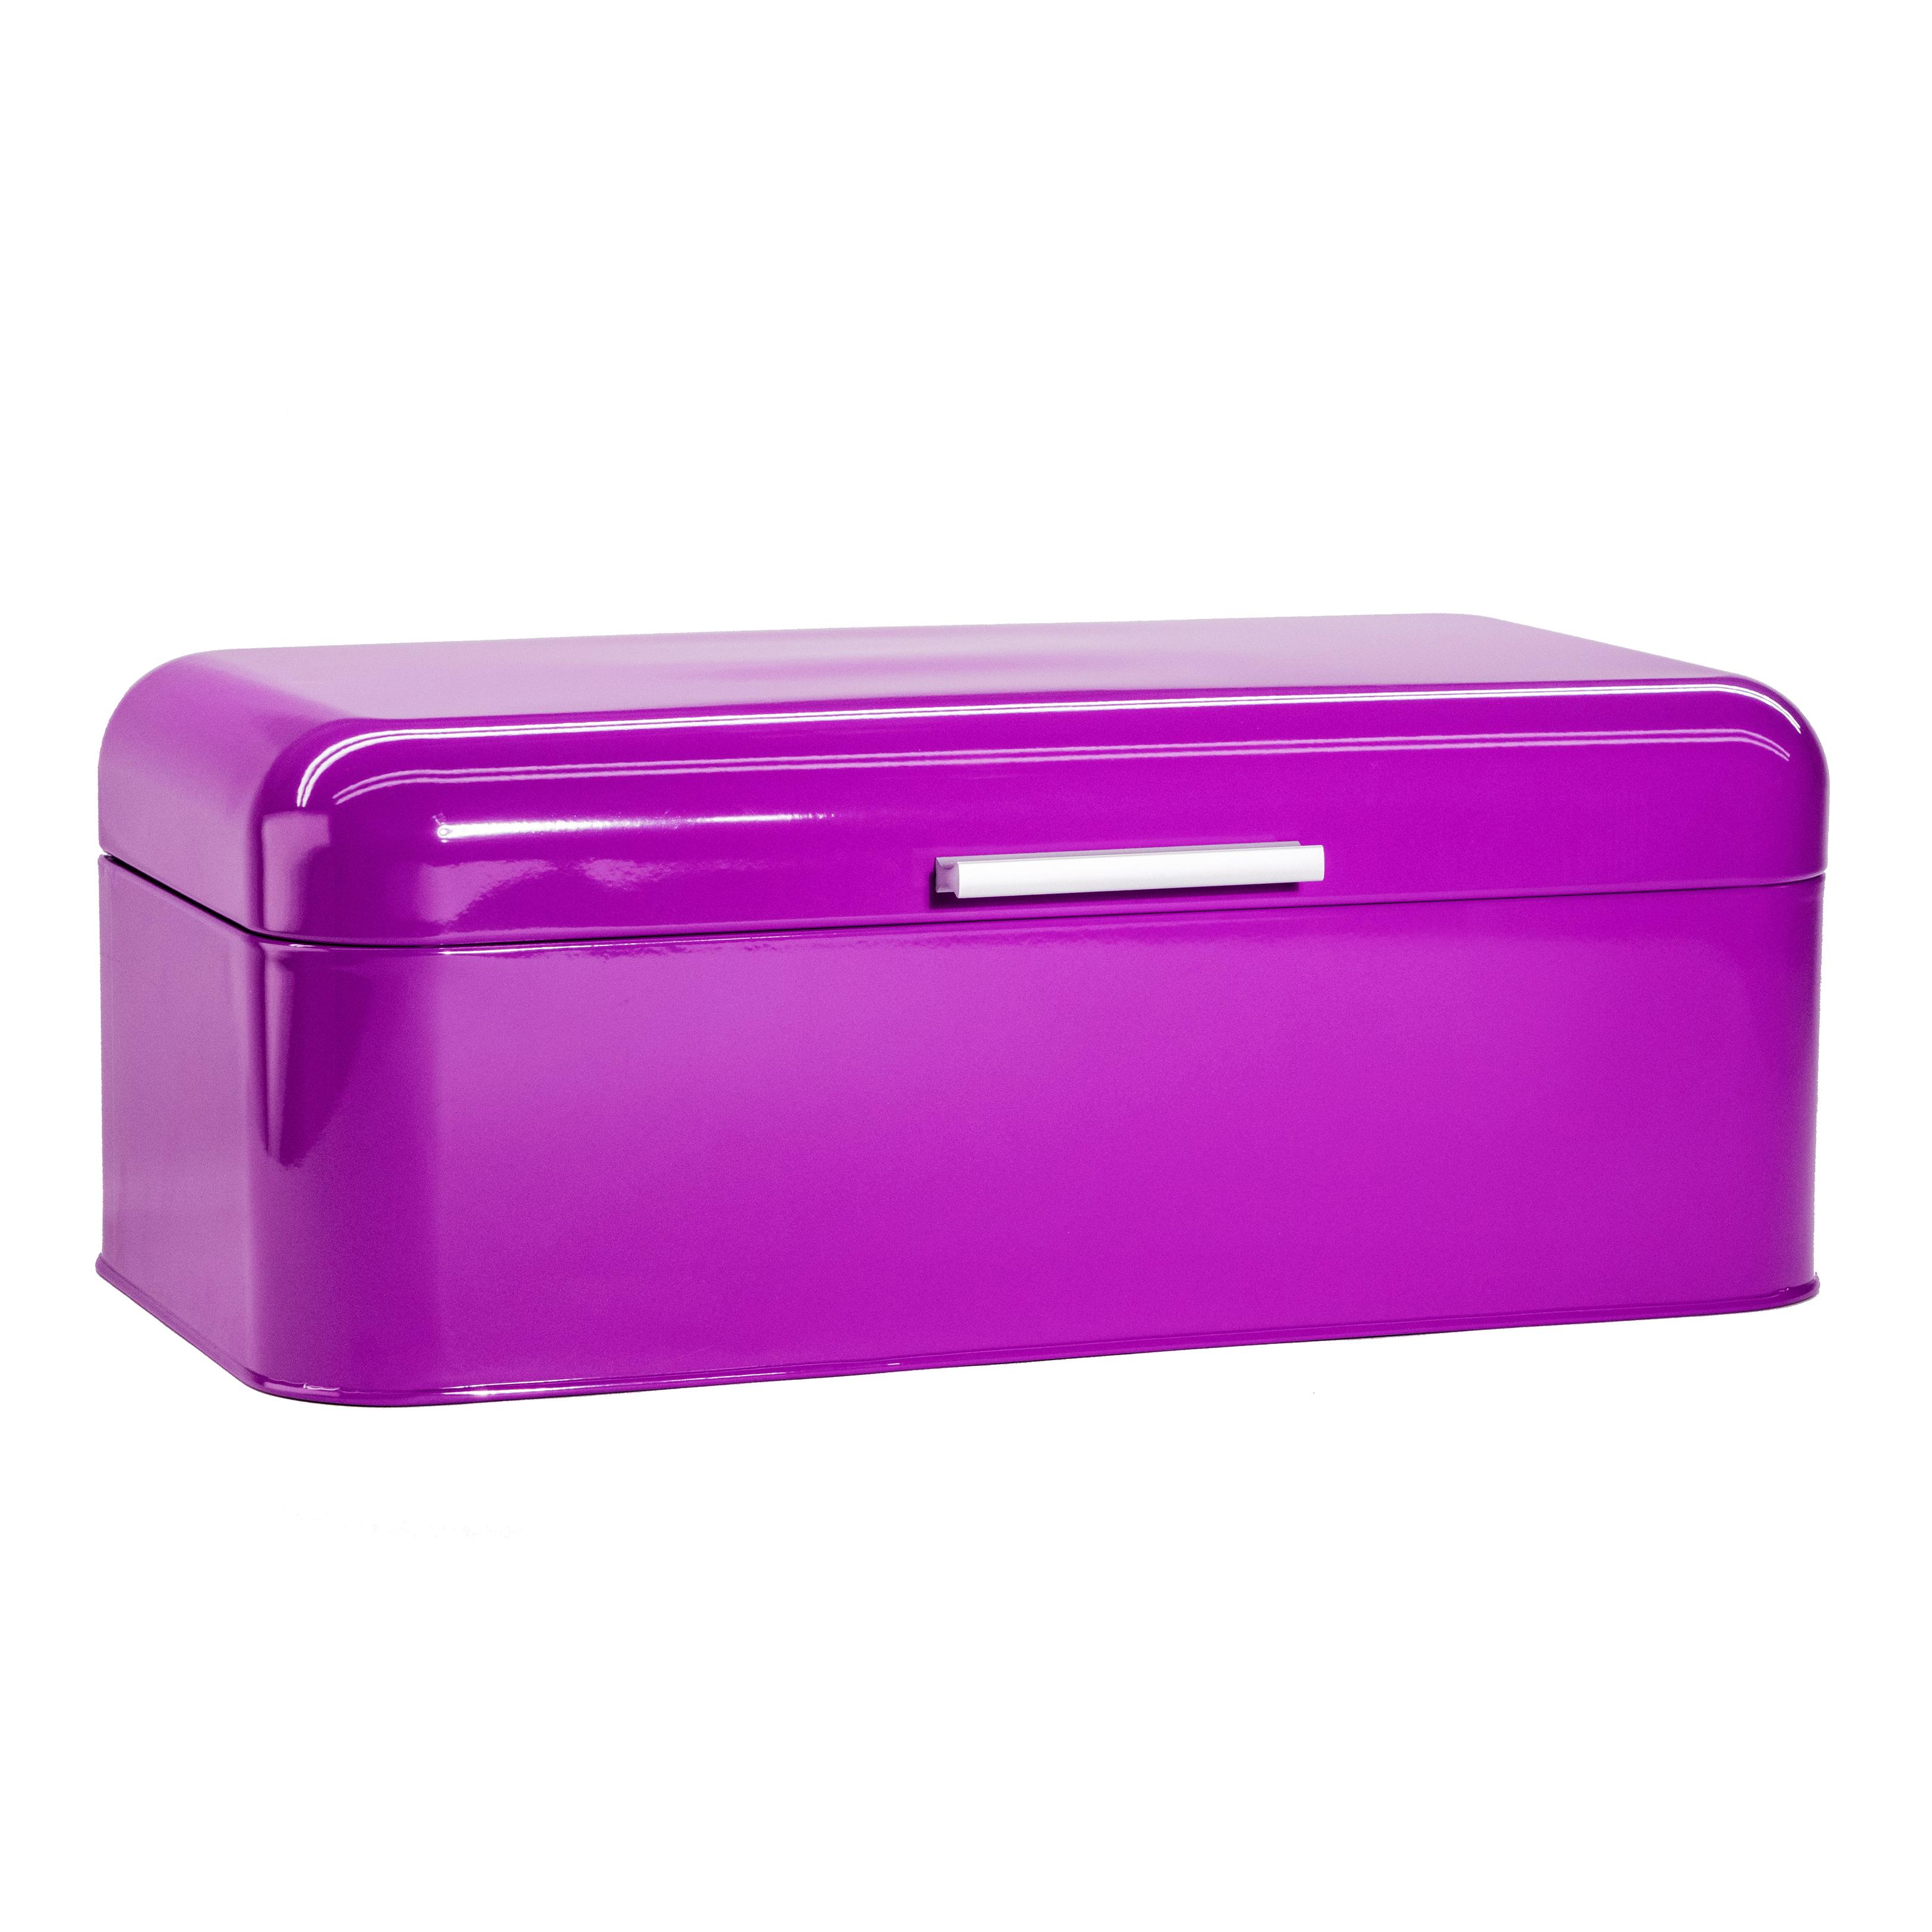 Purple Bread Bin Box copy